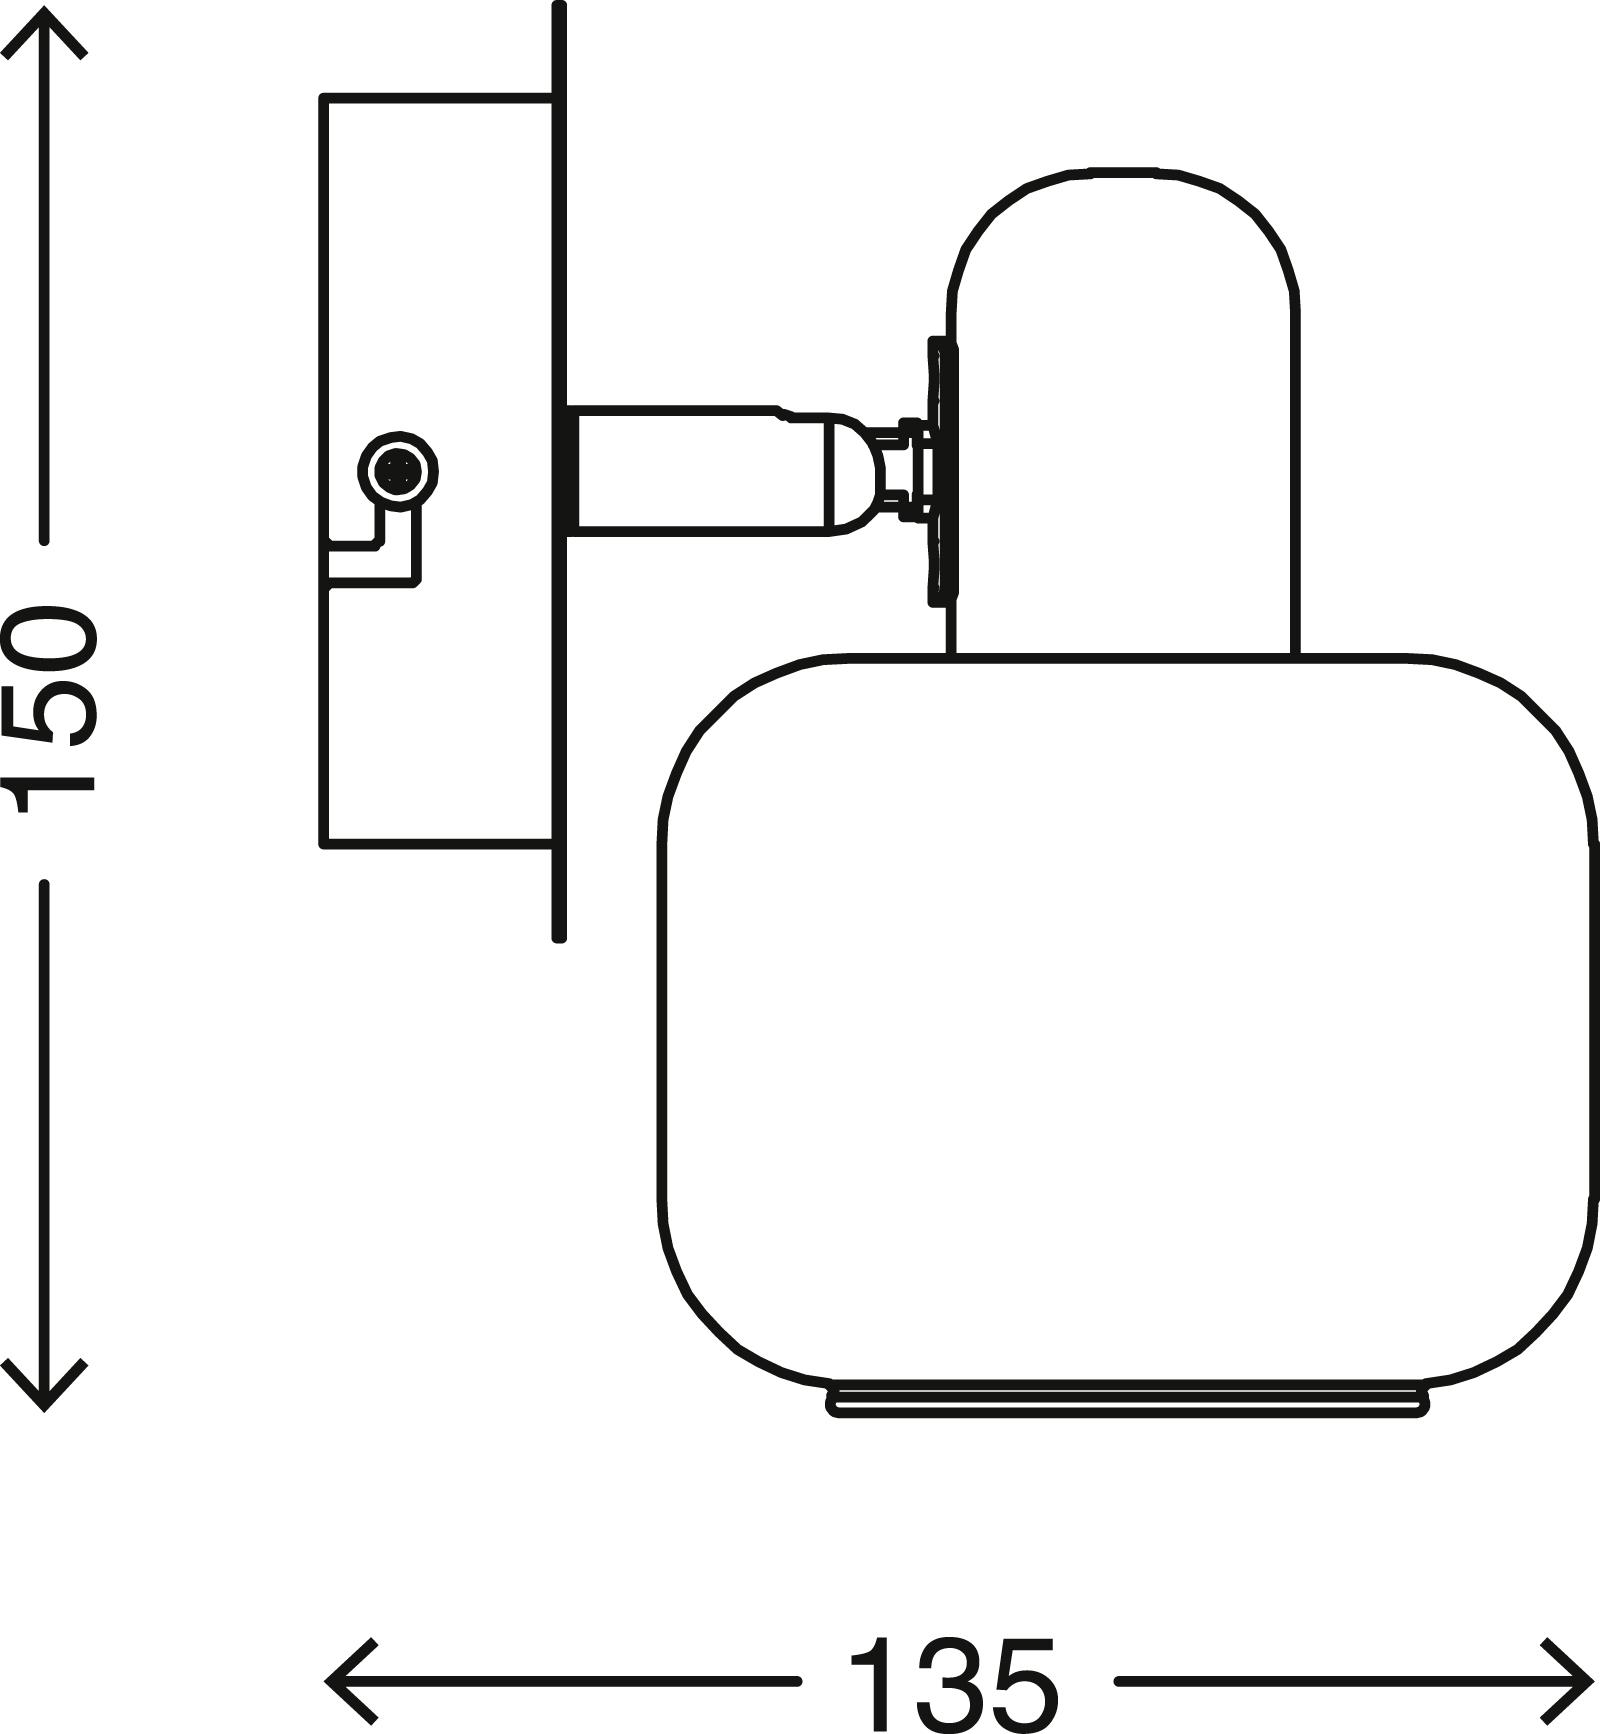 LED Spot Wandleuchte, Ø 10 cm, max. 40 W, Matt-Nickel